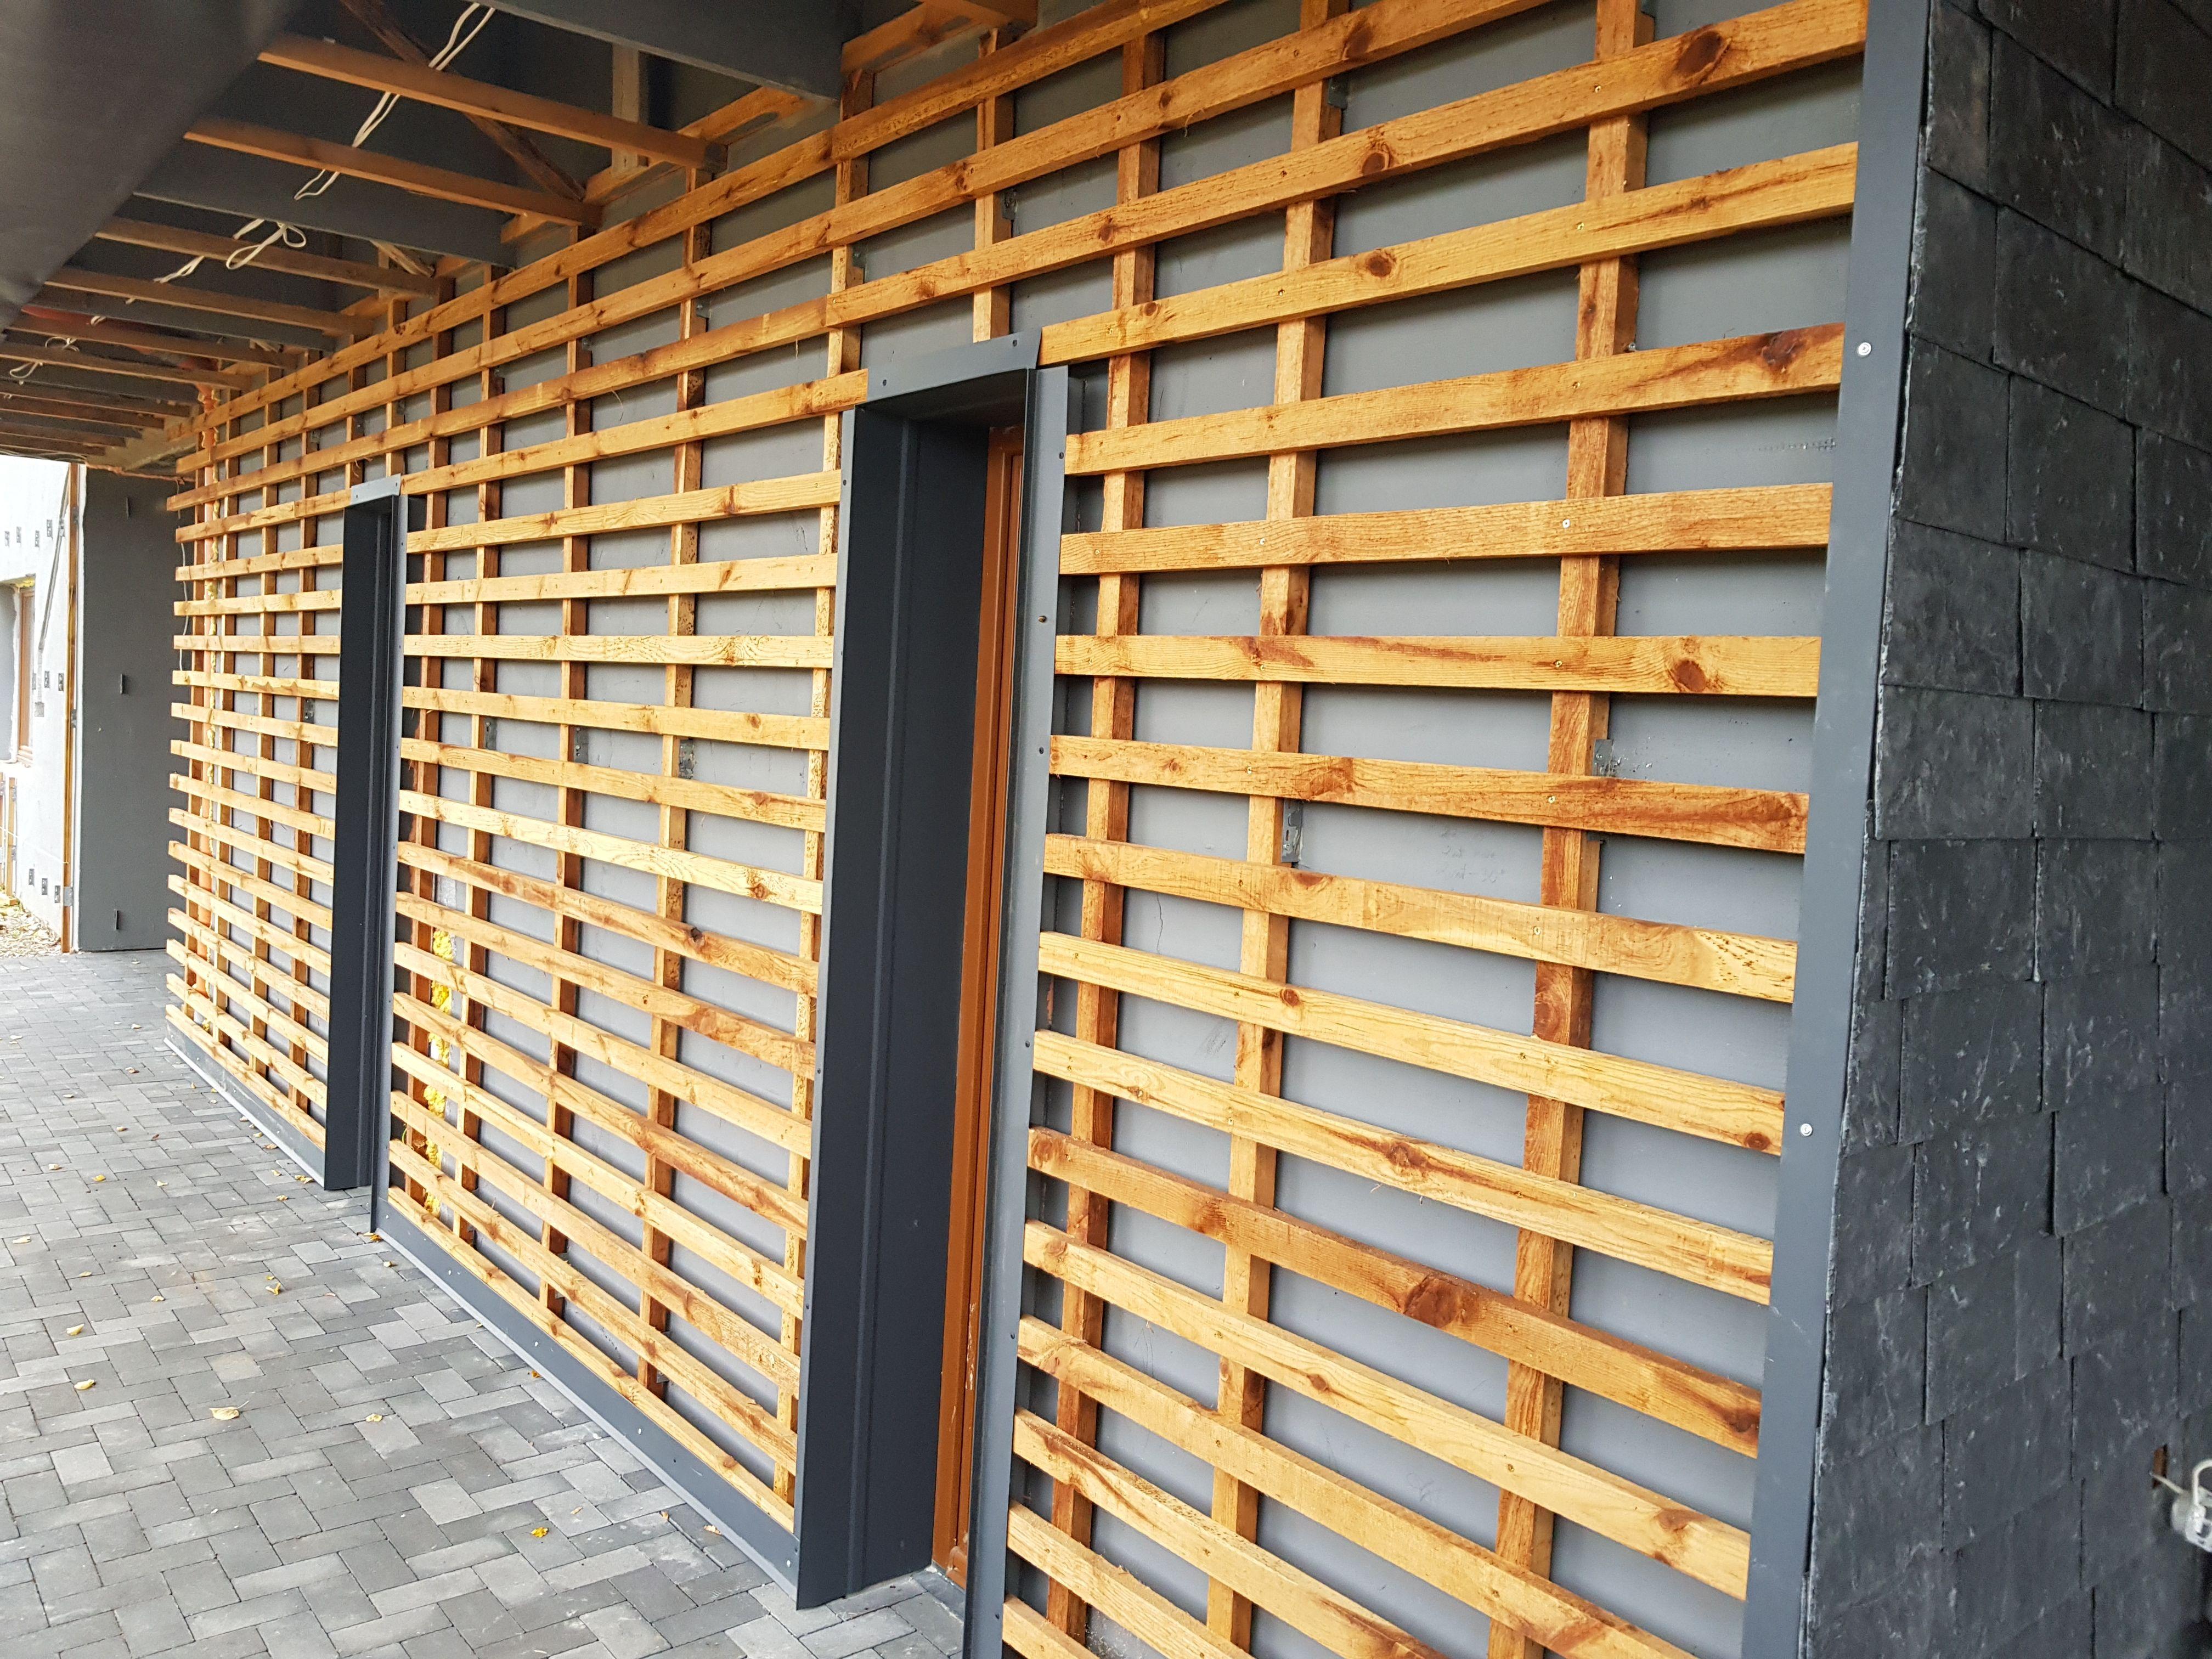 Fasadas Su Domiz 40x20 Cm Skalunu Www Skalunofasadai Lt Exterior Wall Panels Tile Cladding Stone Walls Interior